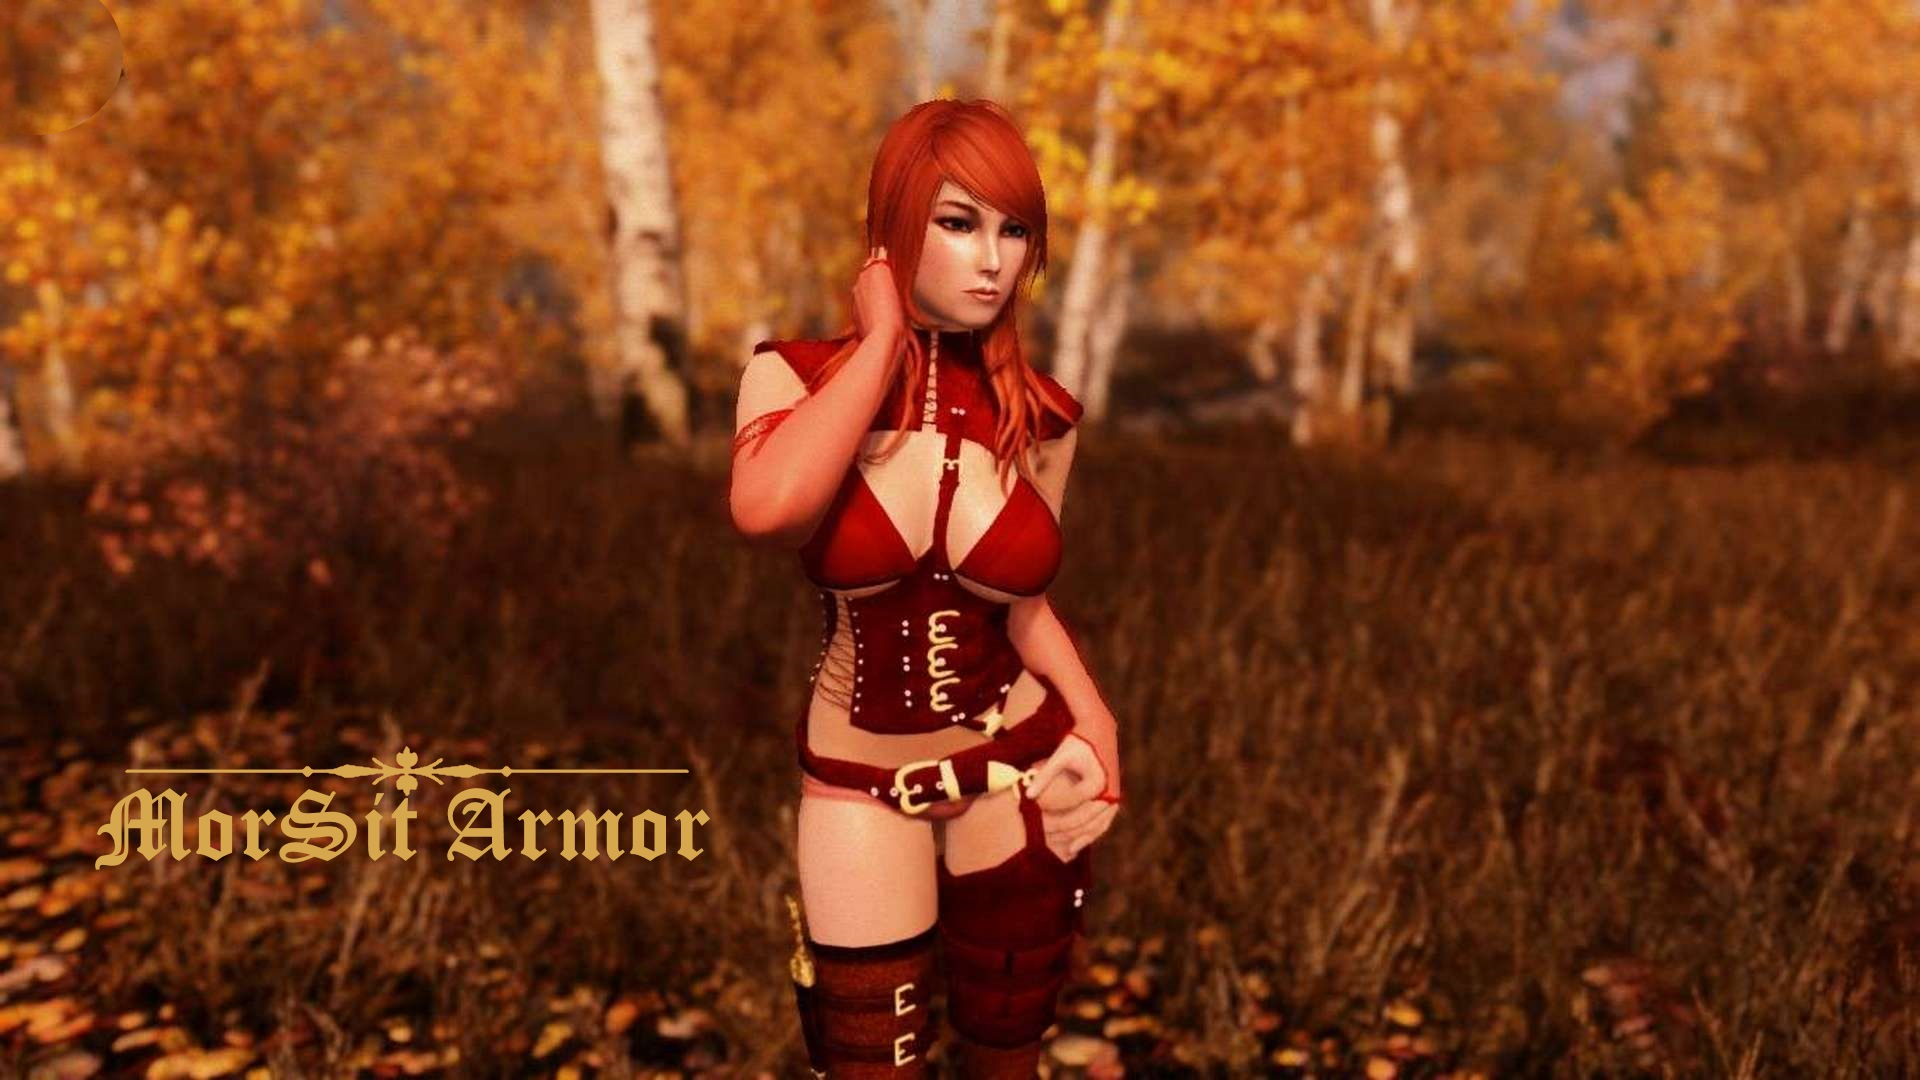 MorSit_armor_UNP_UNPB_CBBE.jpg